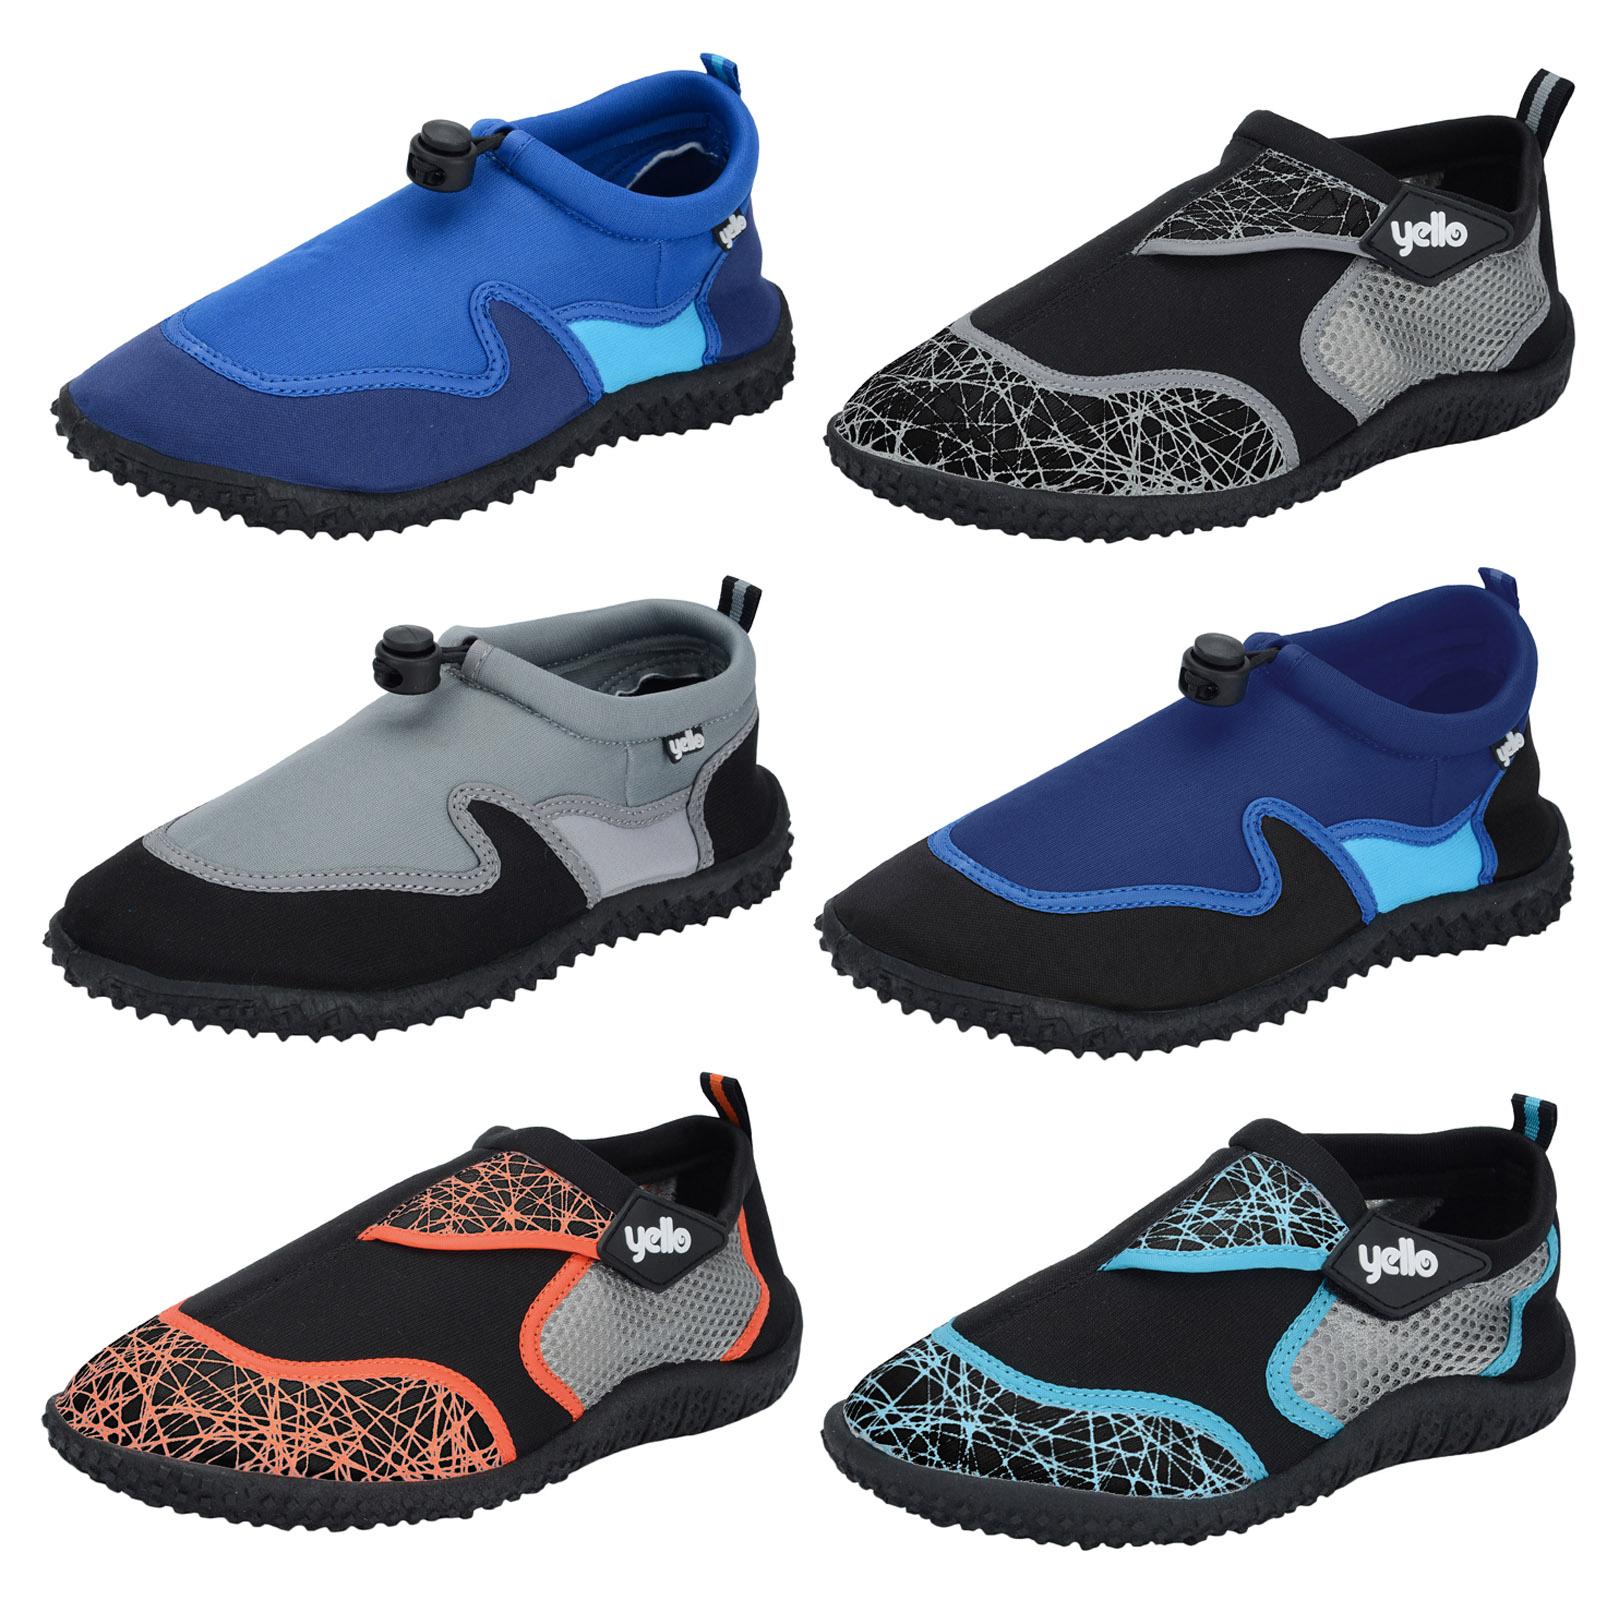 fc6db3617a928e Mens Boys Aqua Socks Beach Water Shoes Scuba Swim Surf Wetsuit Non Slip  Sandals